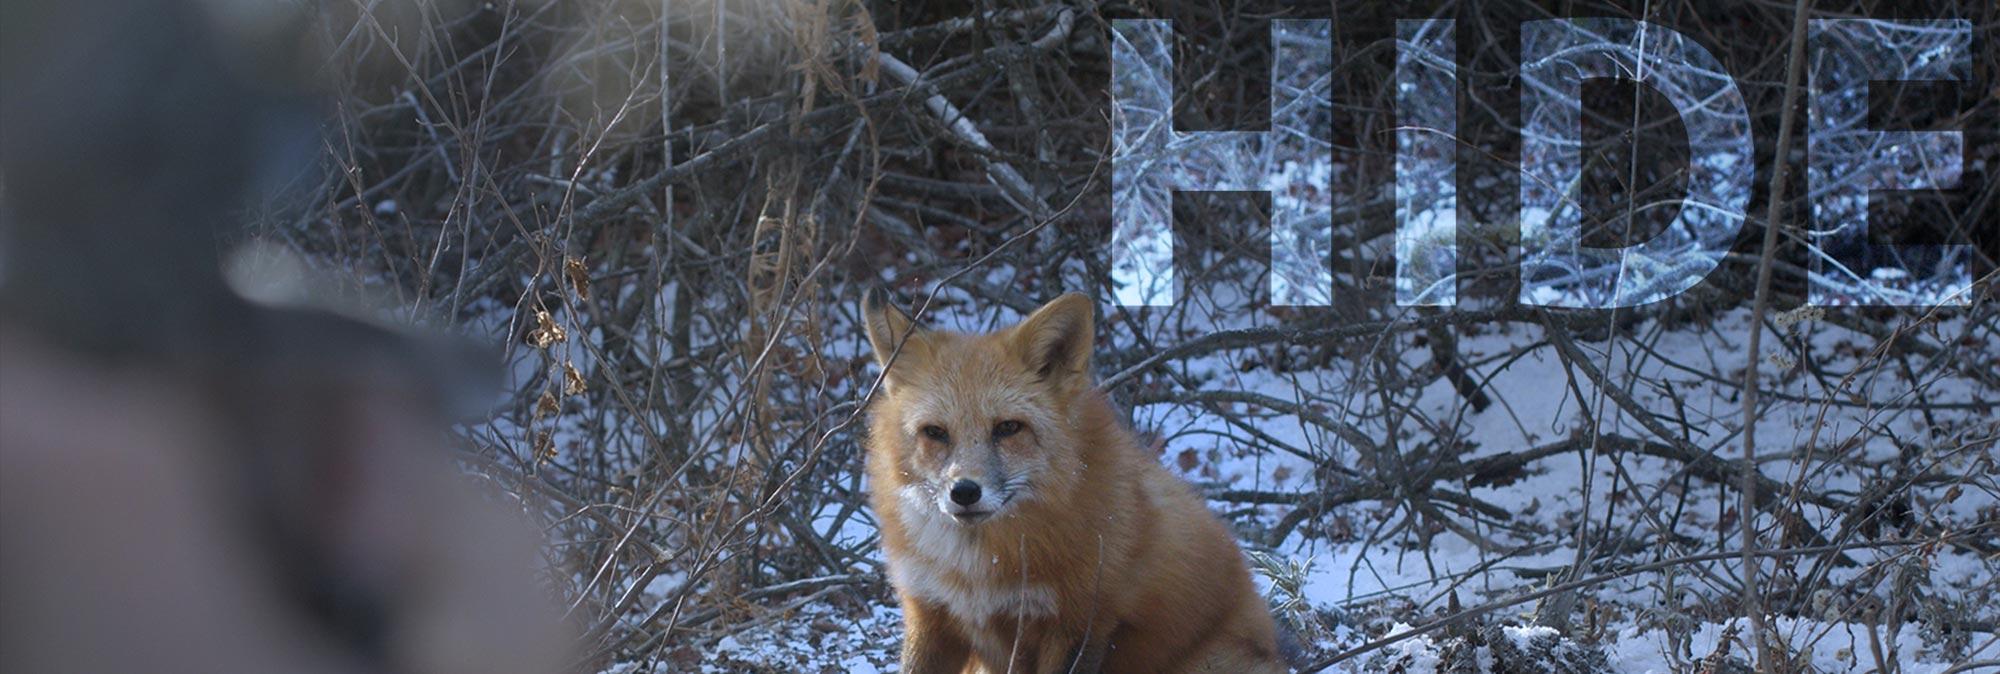 Hide fox